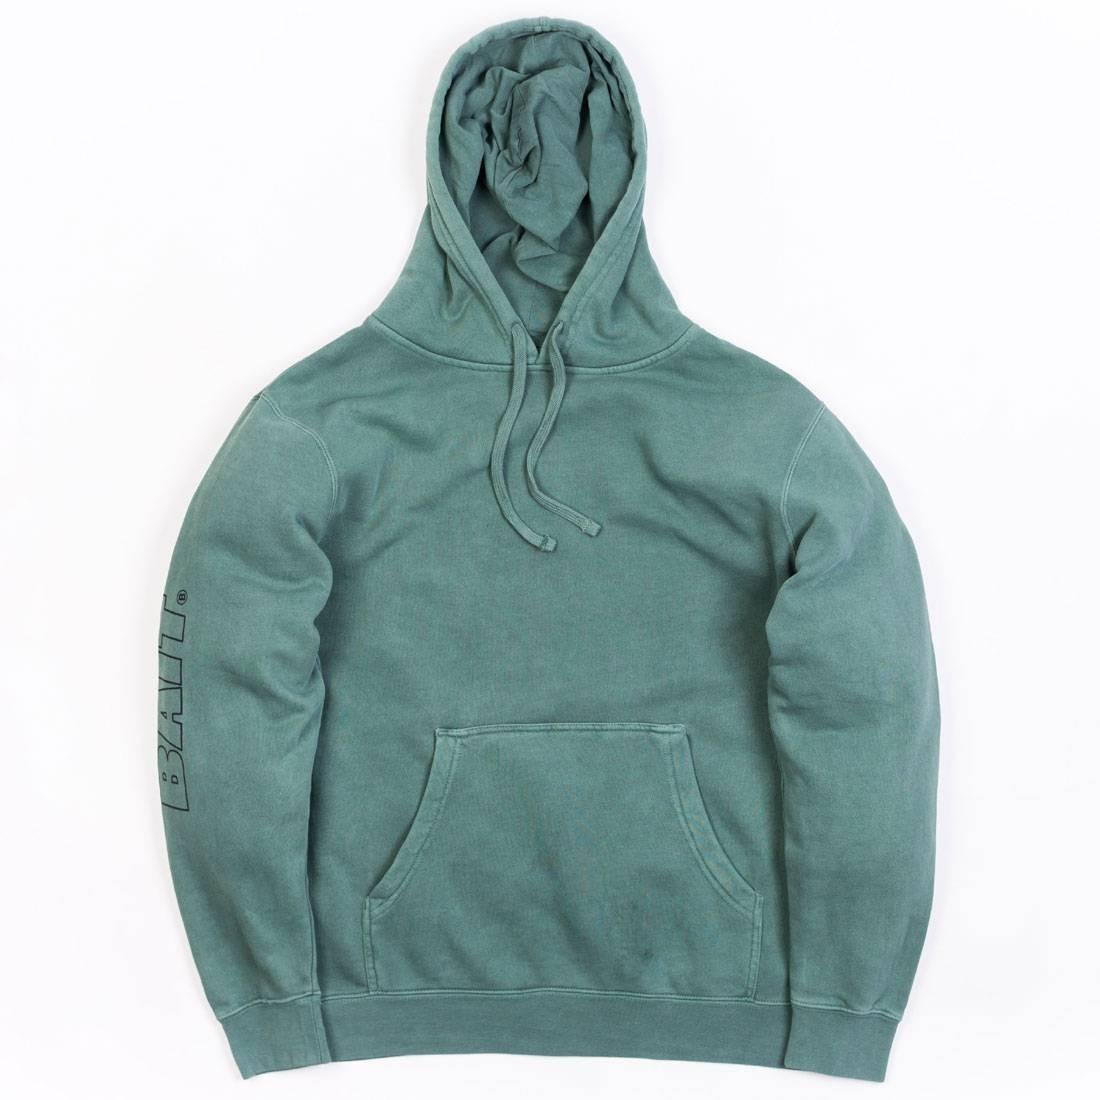 BAIT Men Pigment Dyed Hoody (green / alpine)